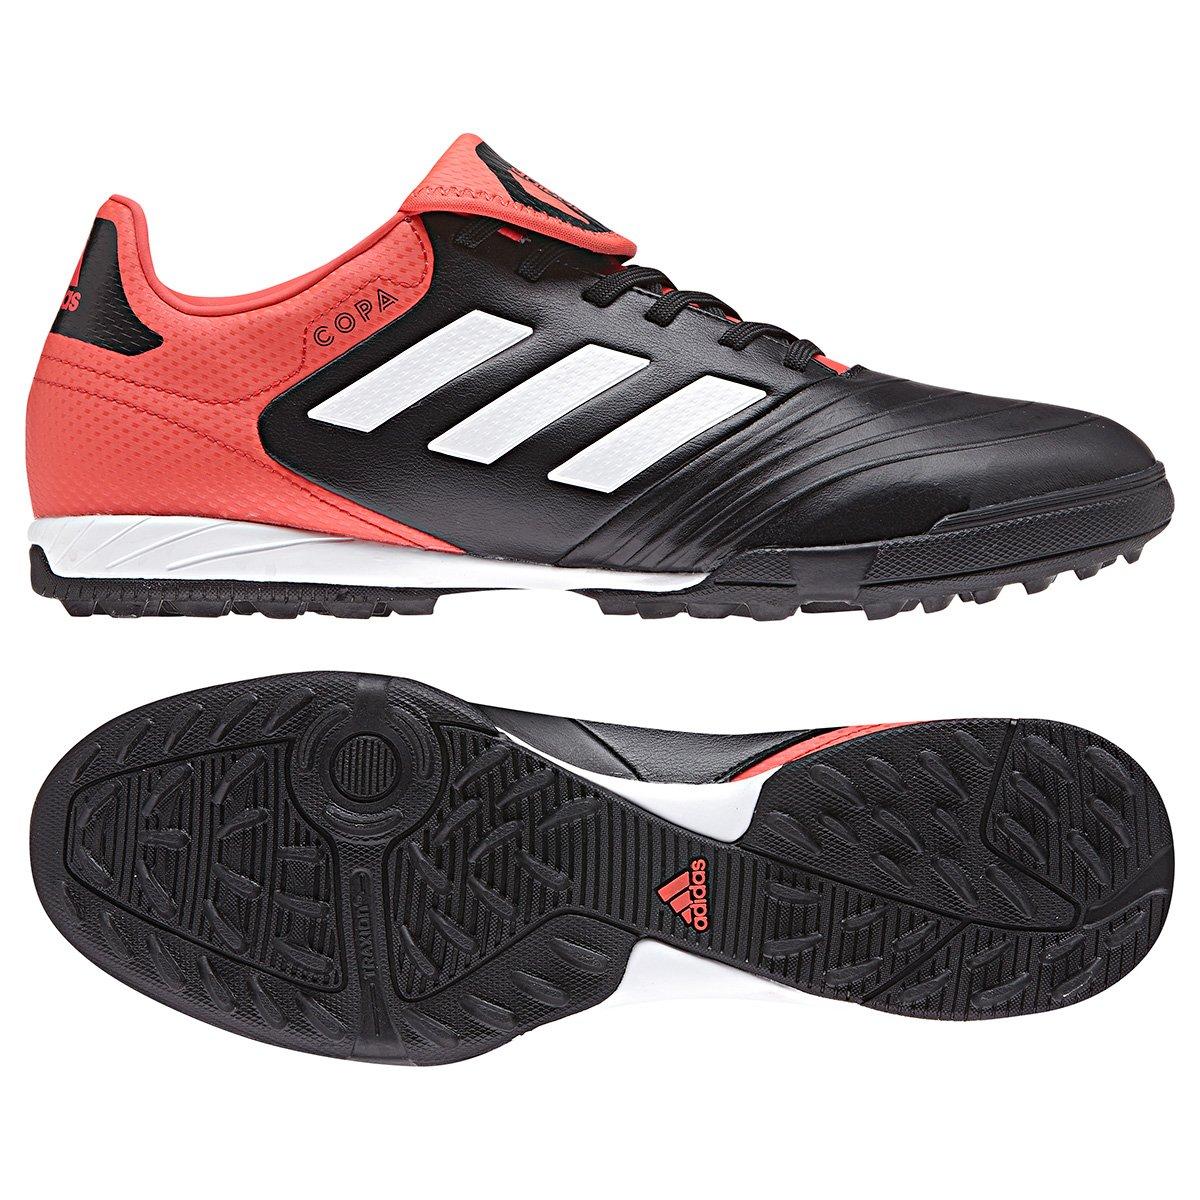 3526c2a428 Chuteira Society Adidas Copa 18.3 TF - Preto e Vermelho